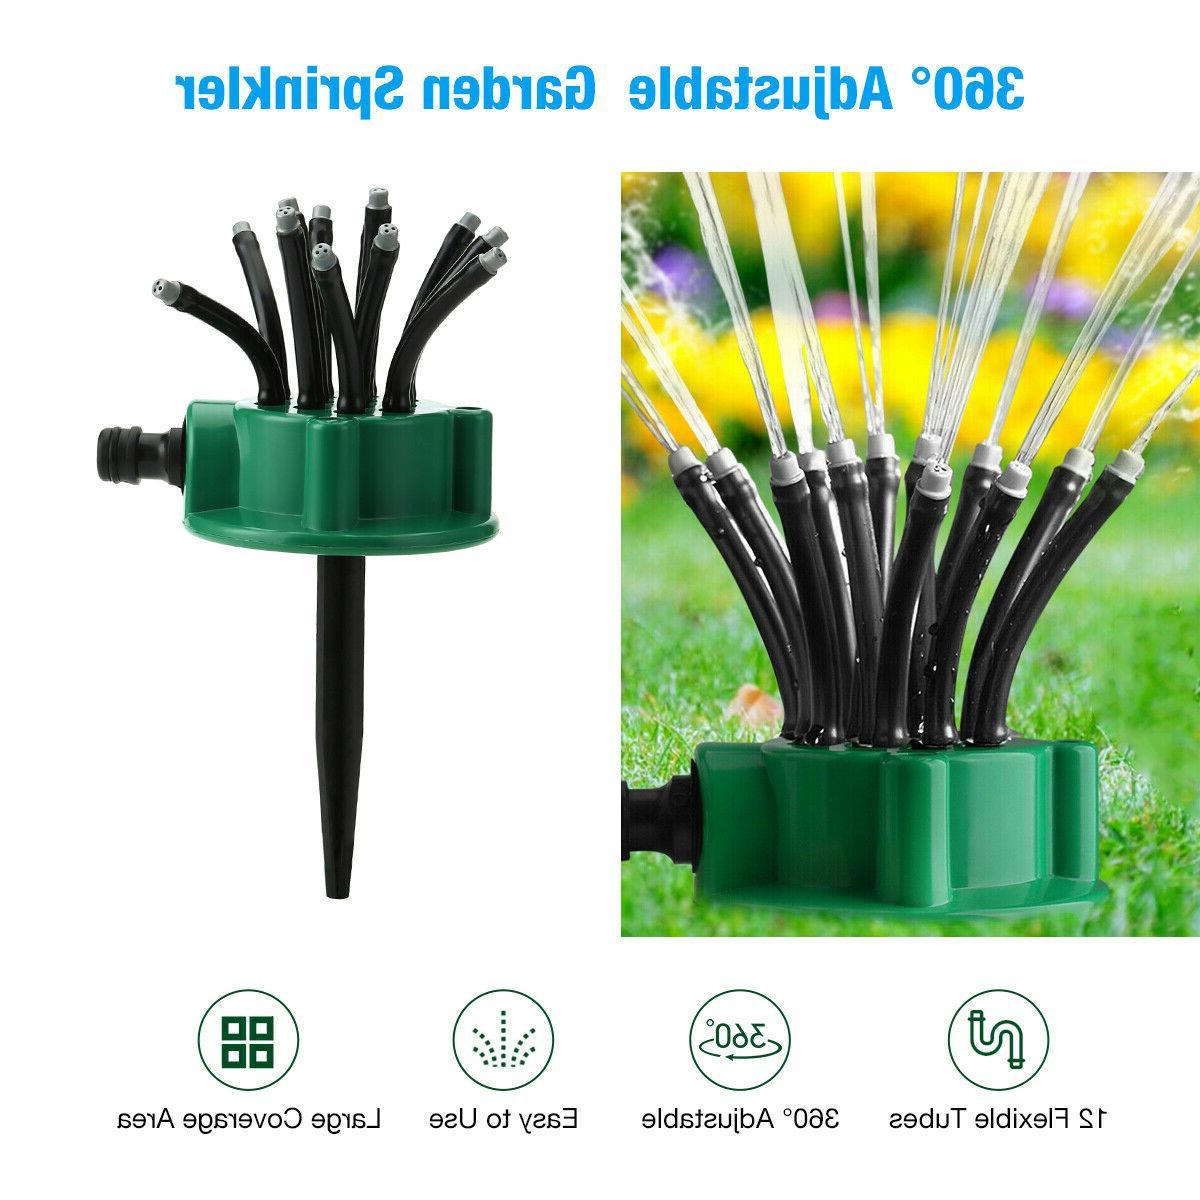 360° Flexible Lawn Sprinklers Automatic Watering Noodlehead Garden